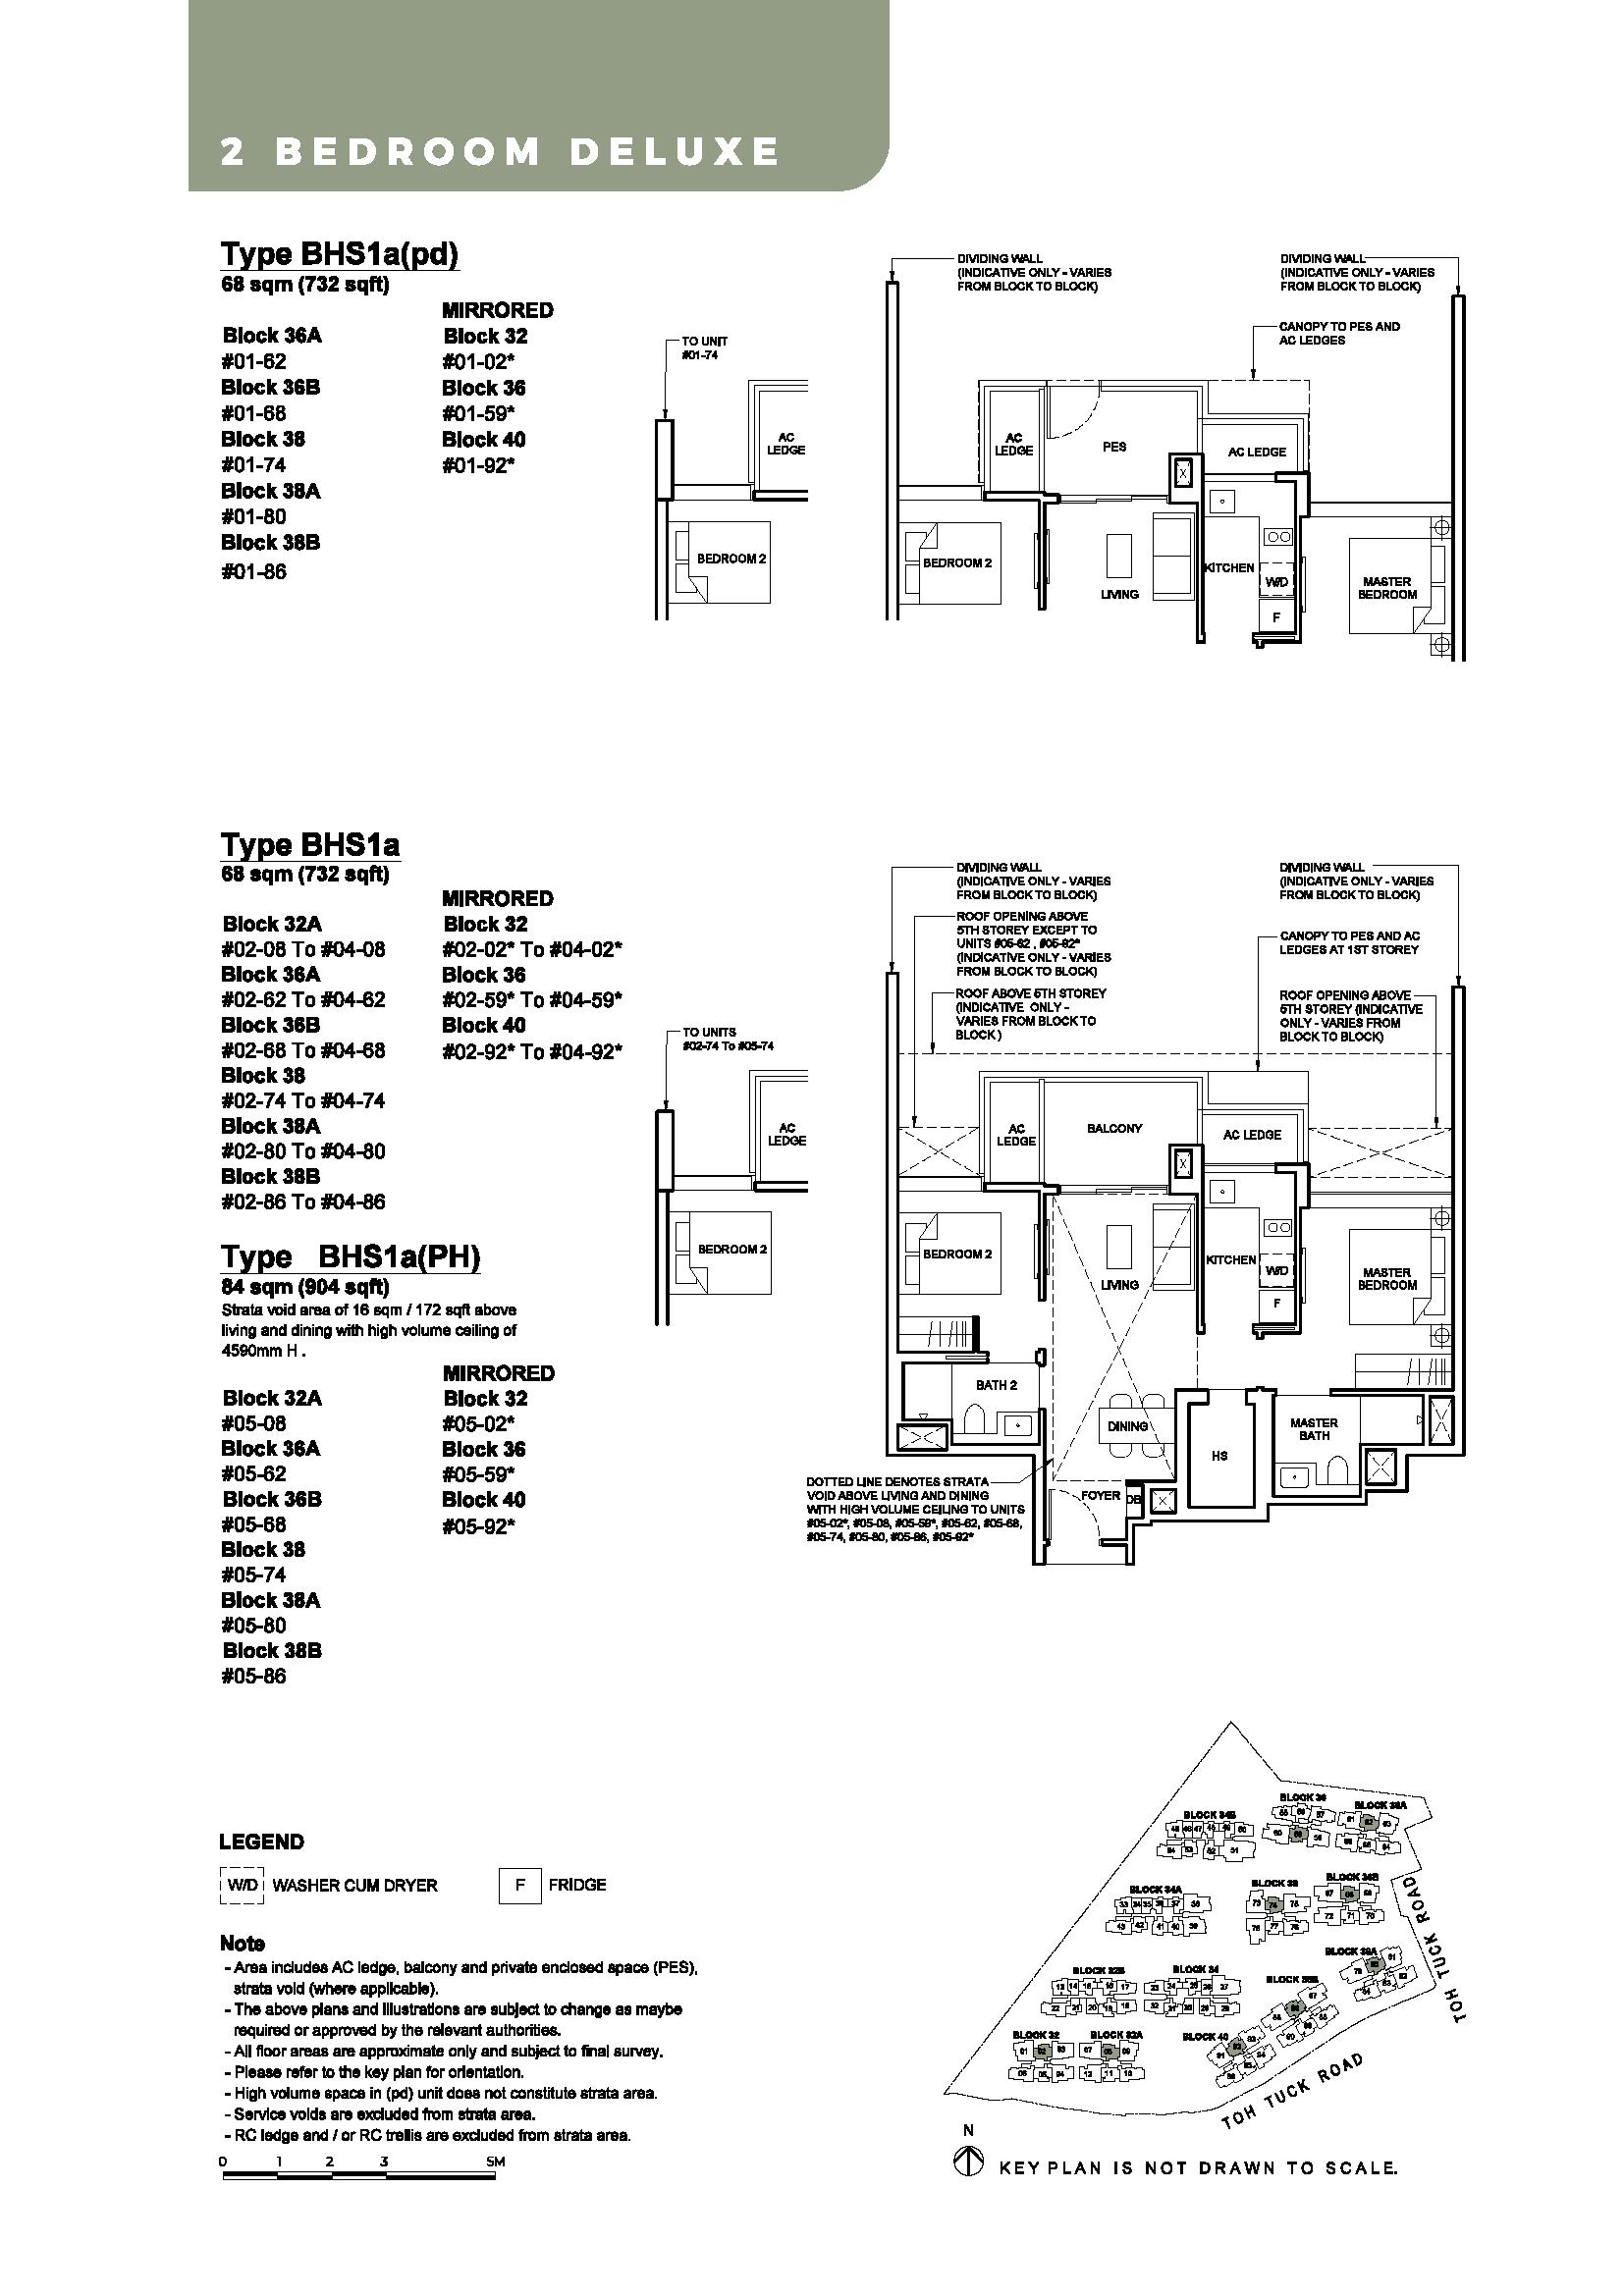 Type BHS1a - BHS1a(pd) - BHS1a(PH)